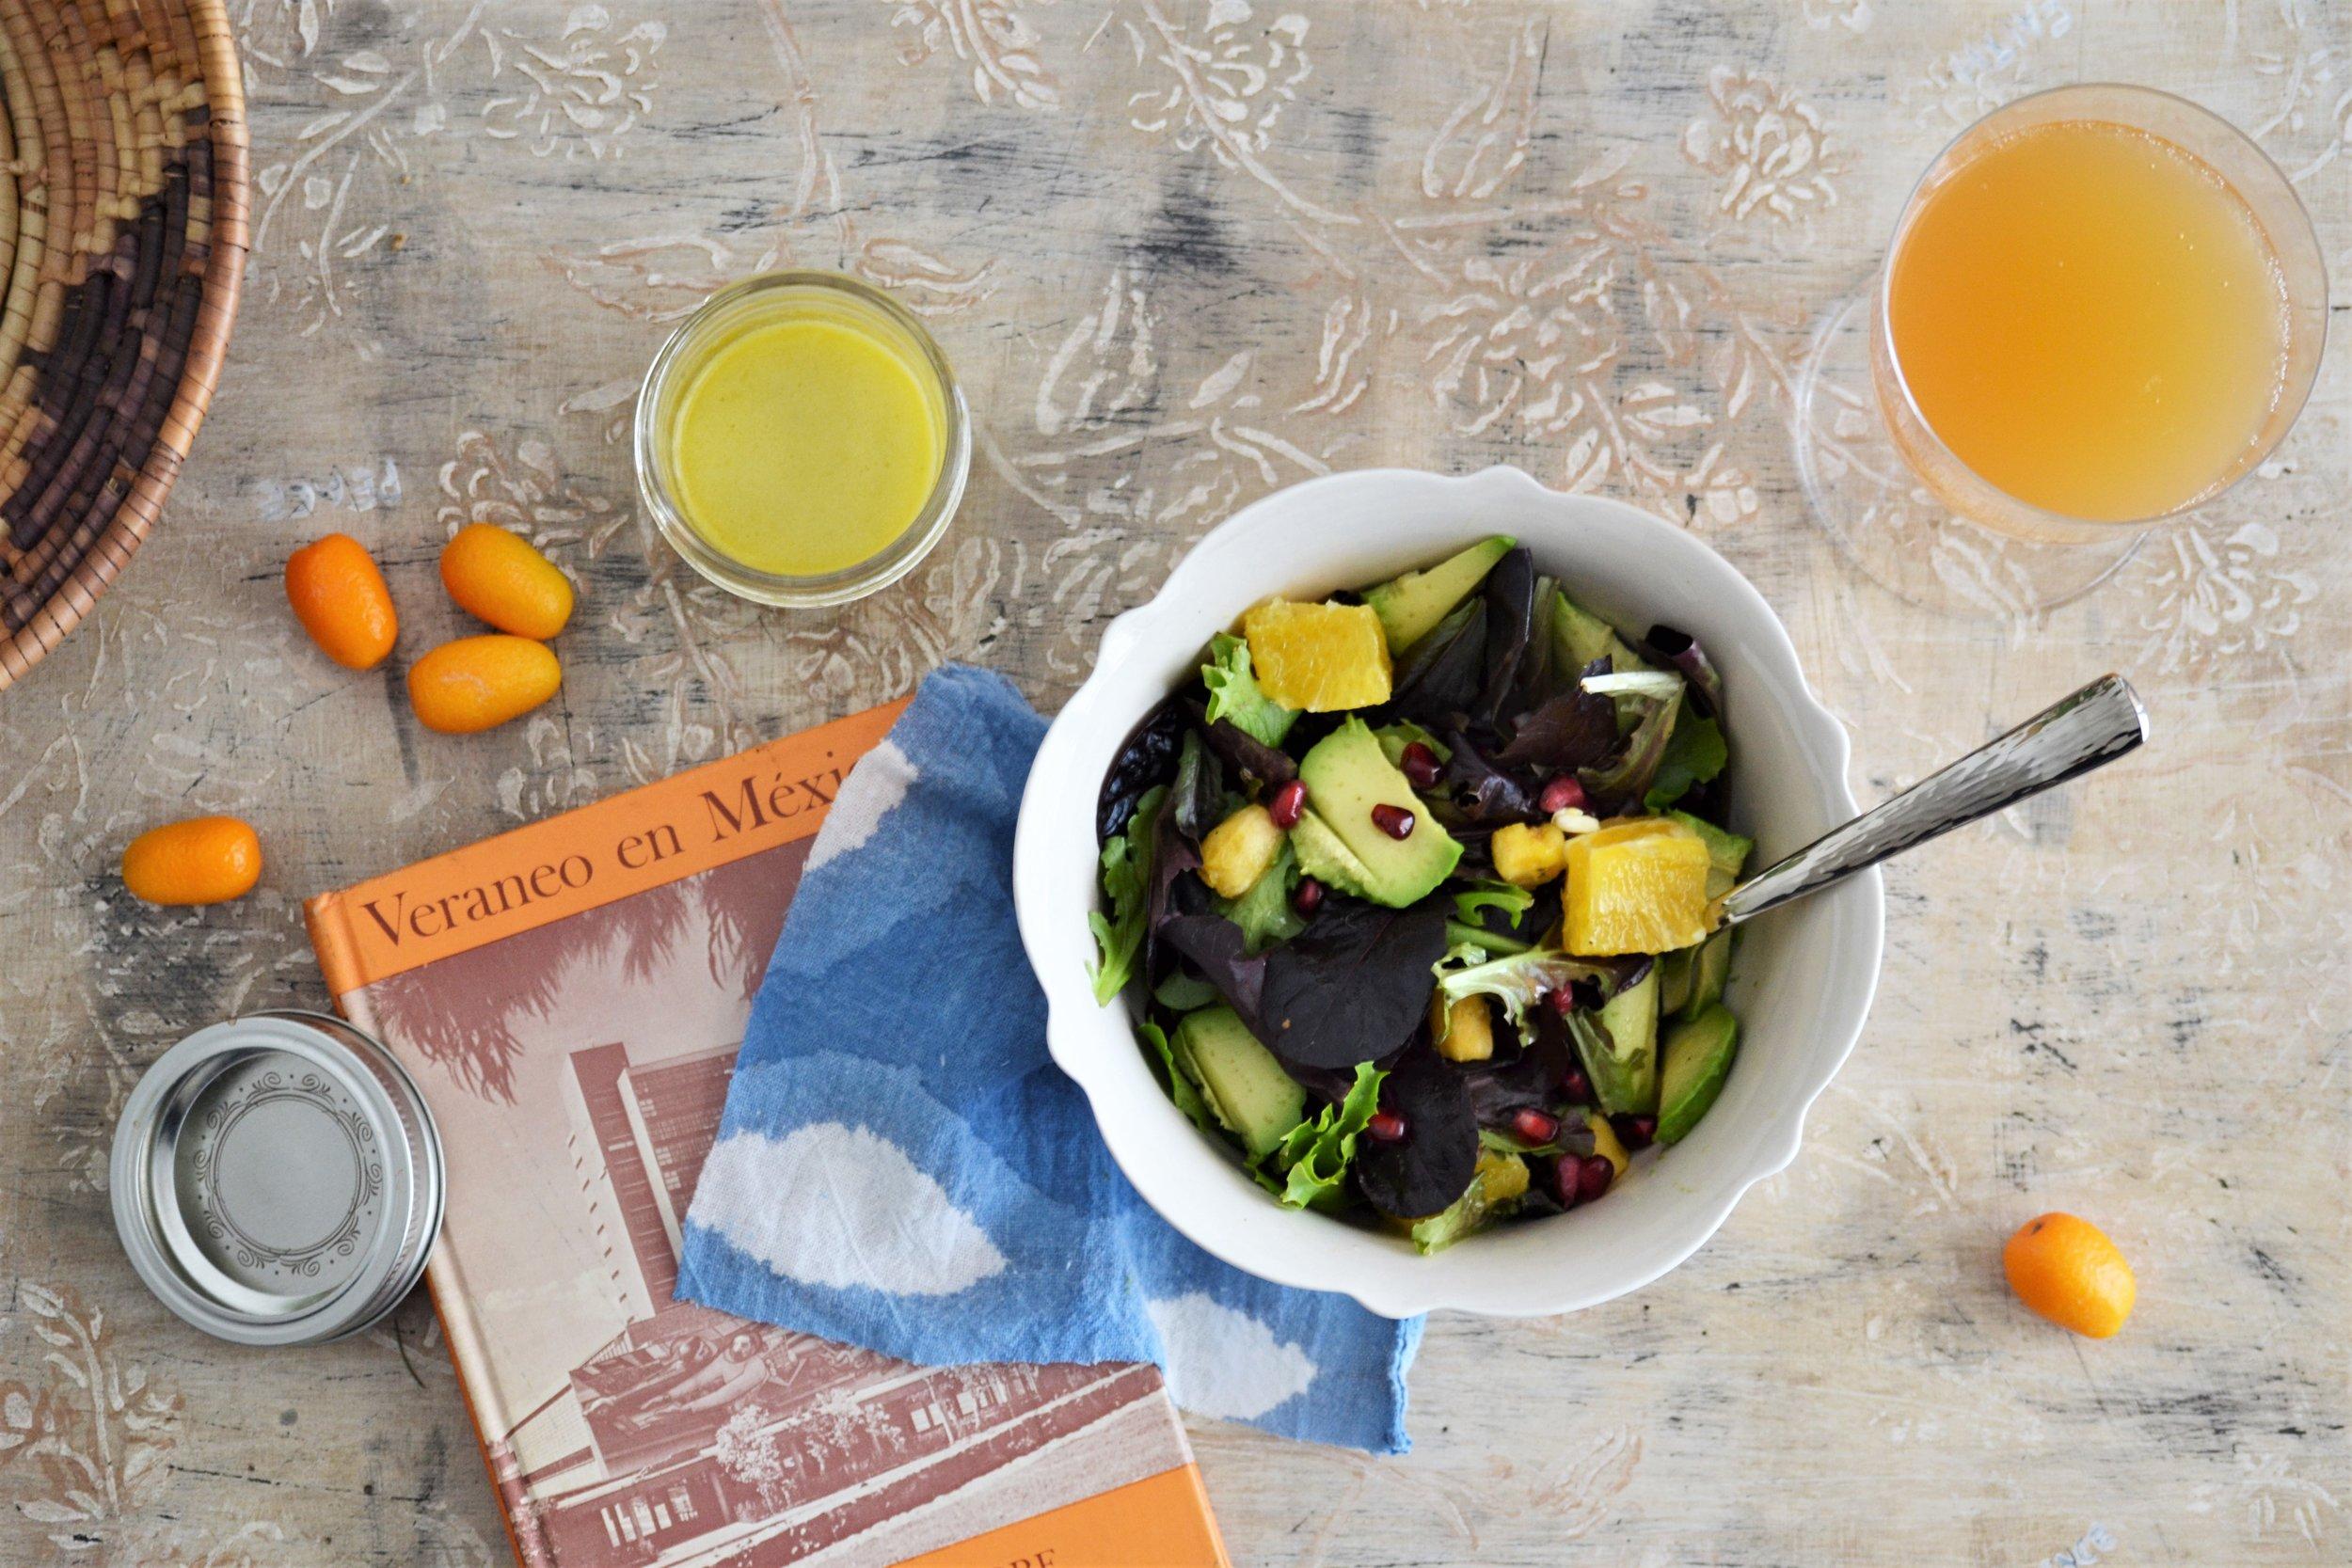 Winter Citrus Salad -